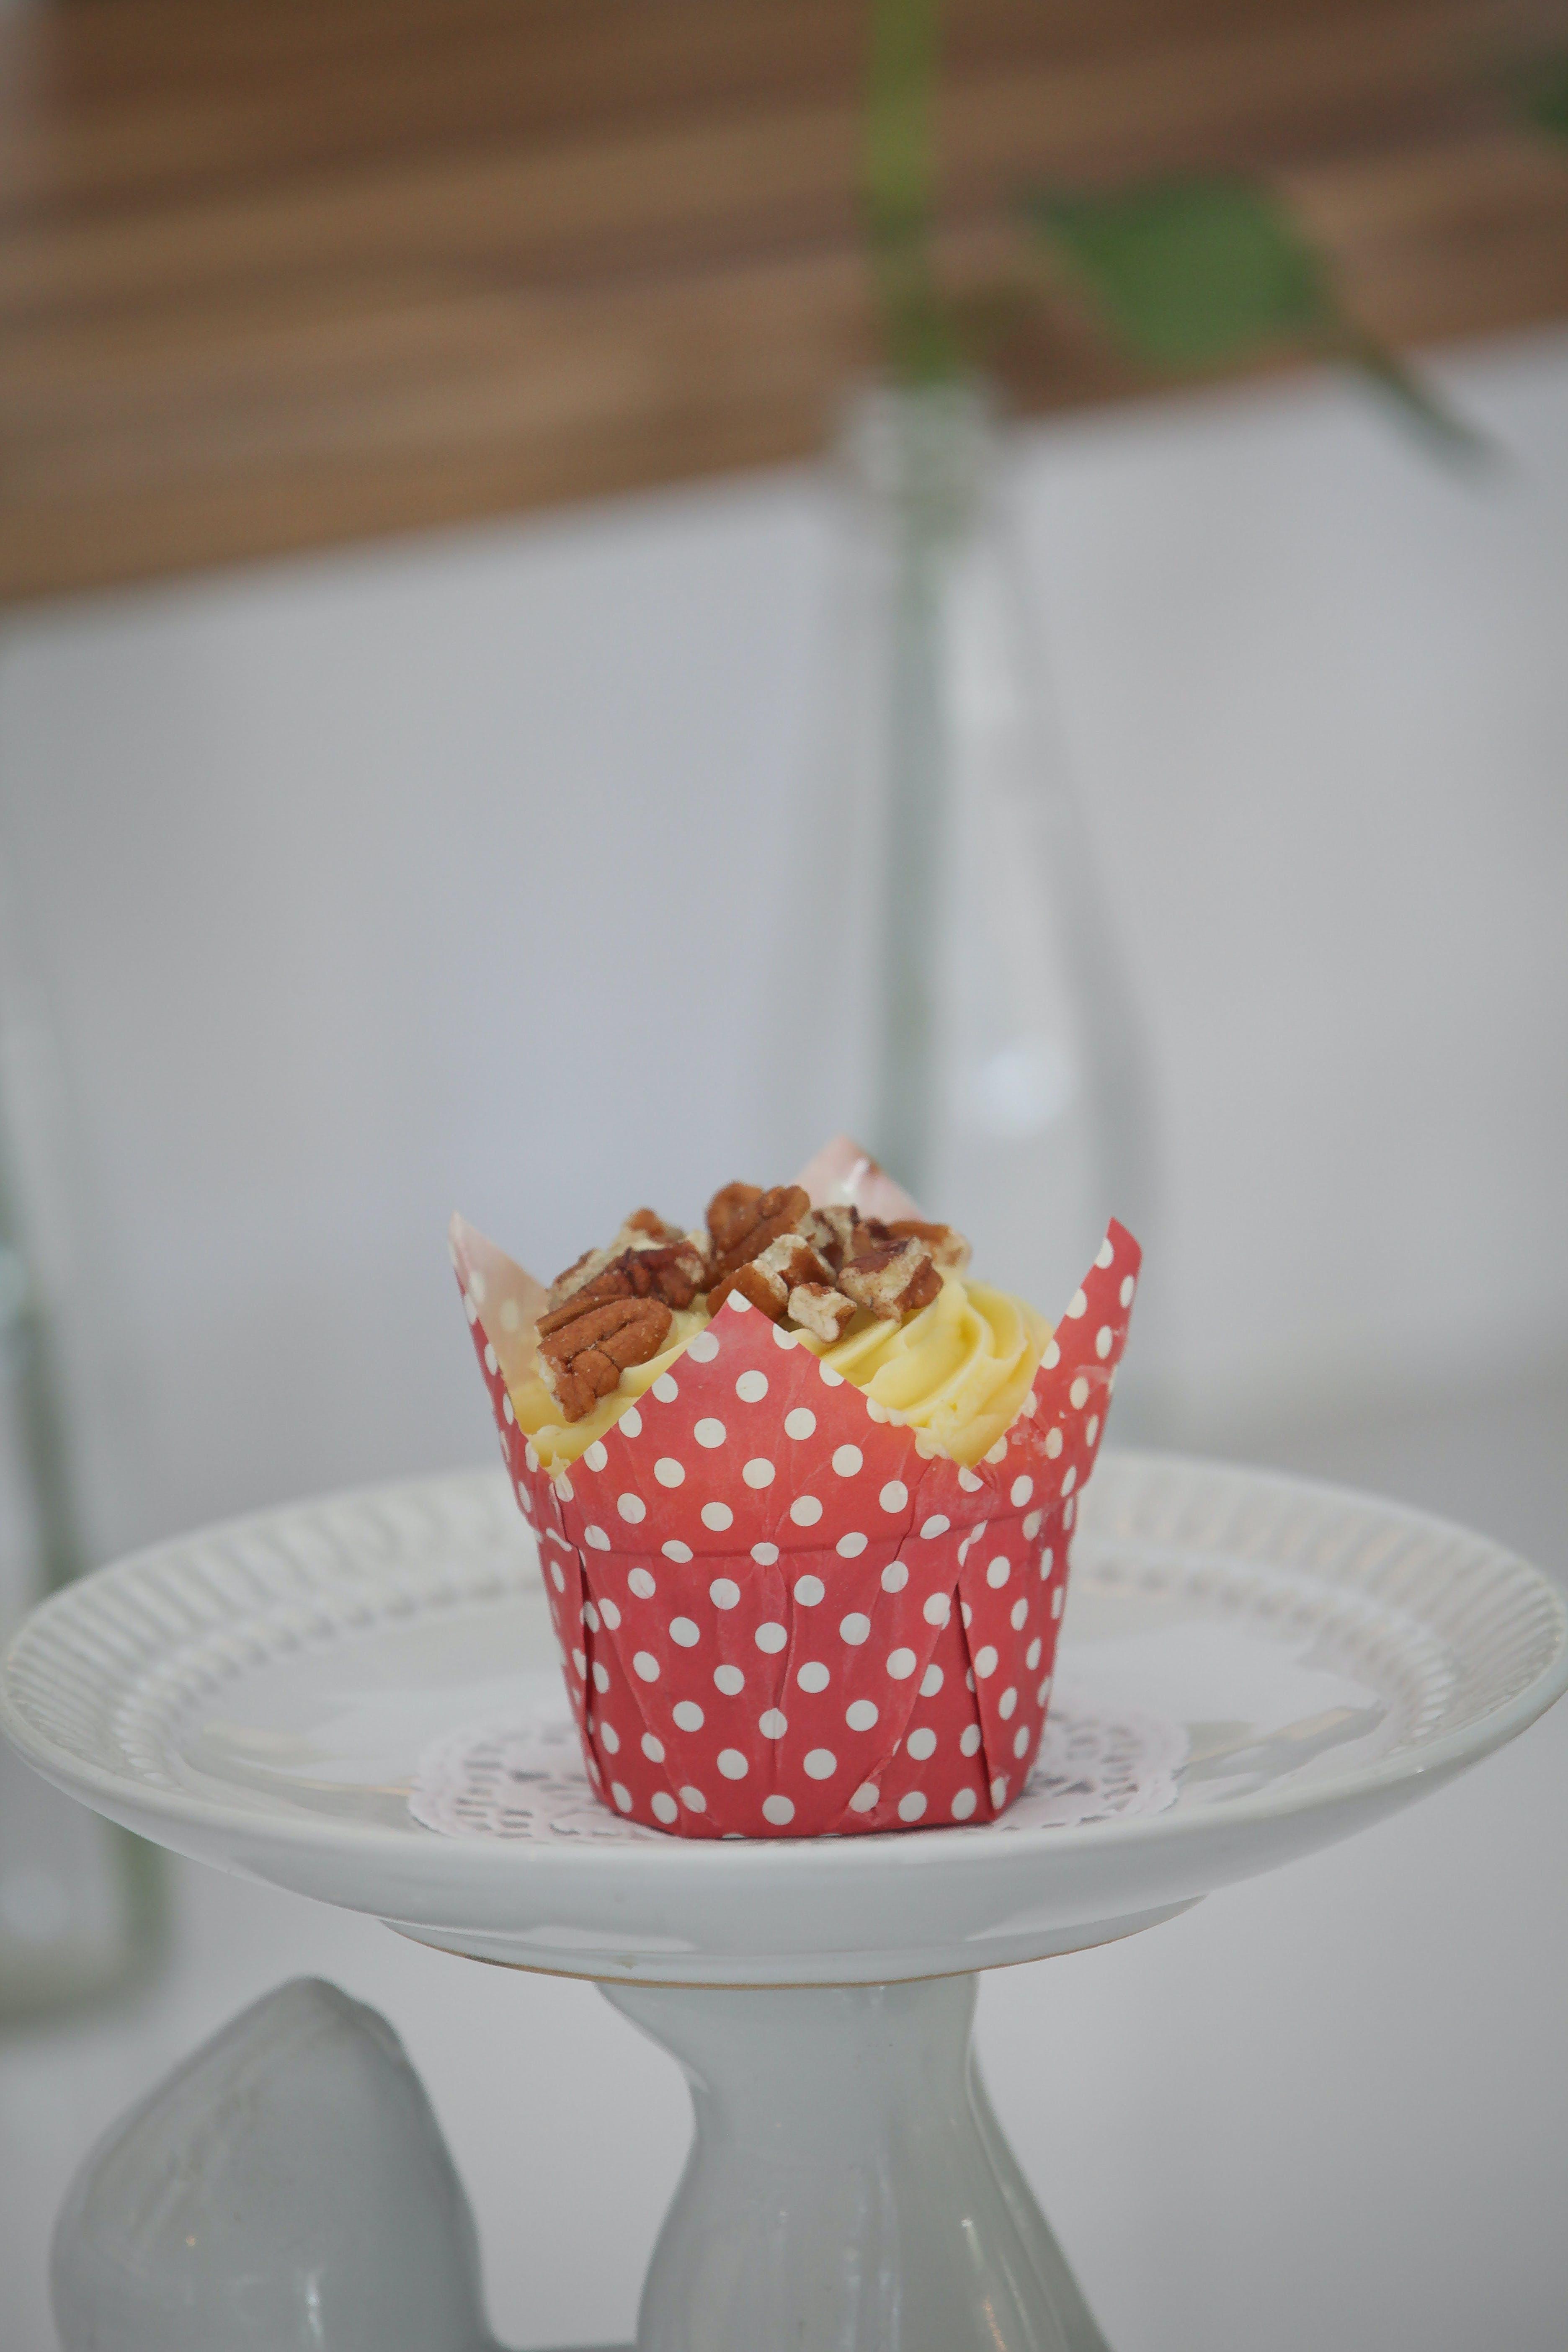 Yellow and Brown Cupcake on White Round Ceramic Plate